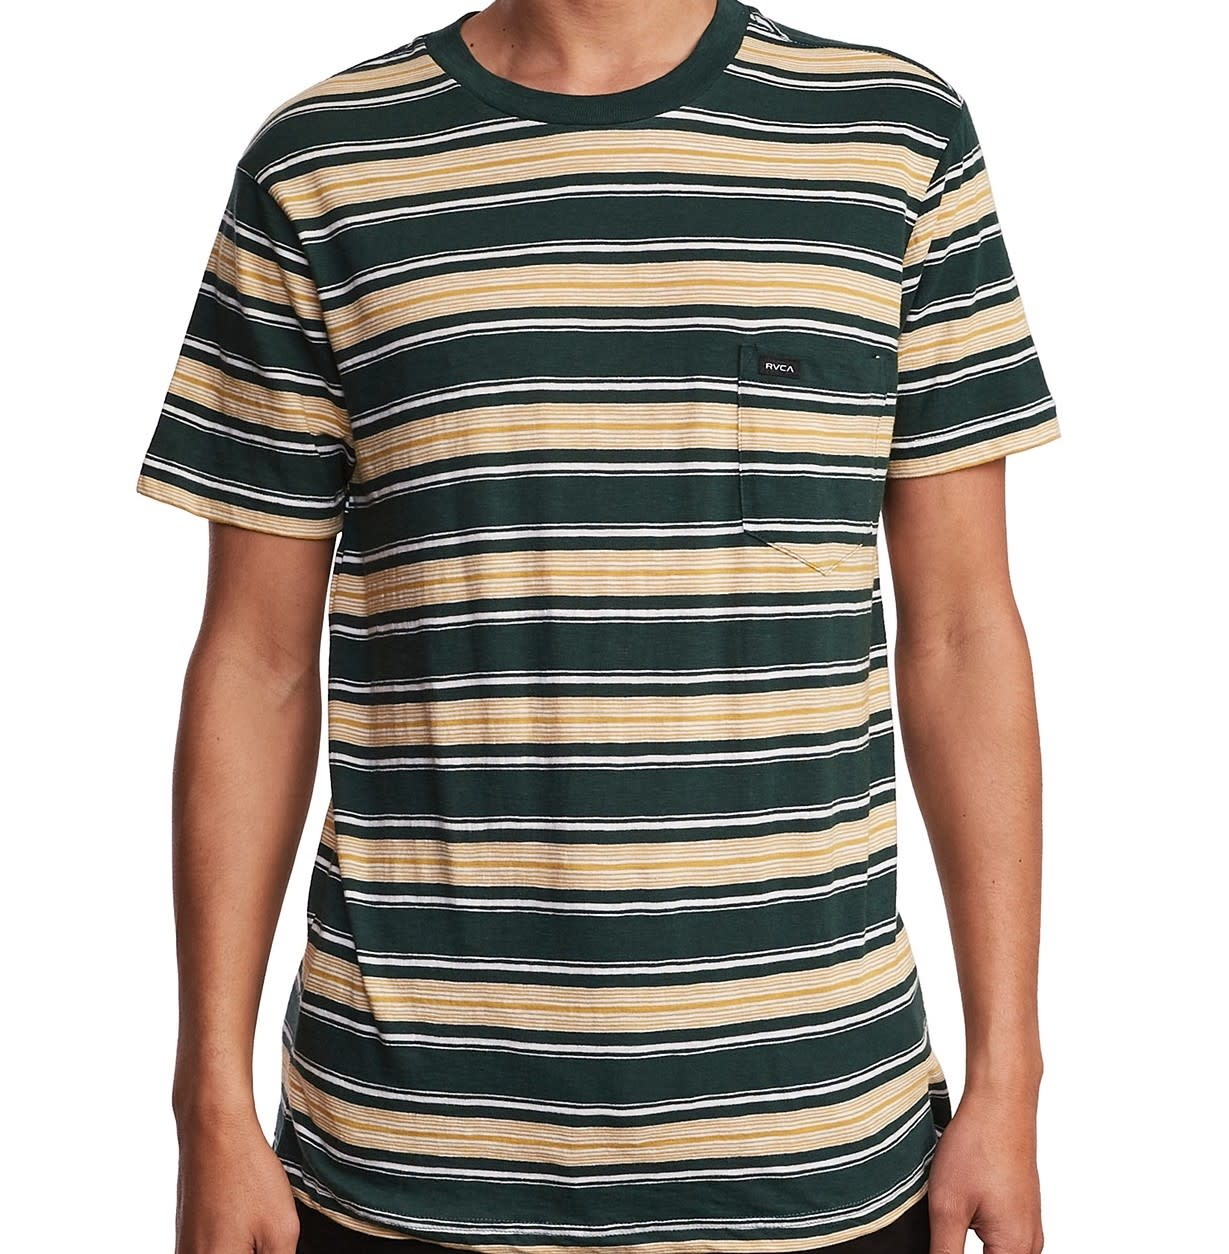 RVCA Hank Stripe S/S Green/Yellow